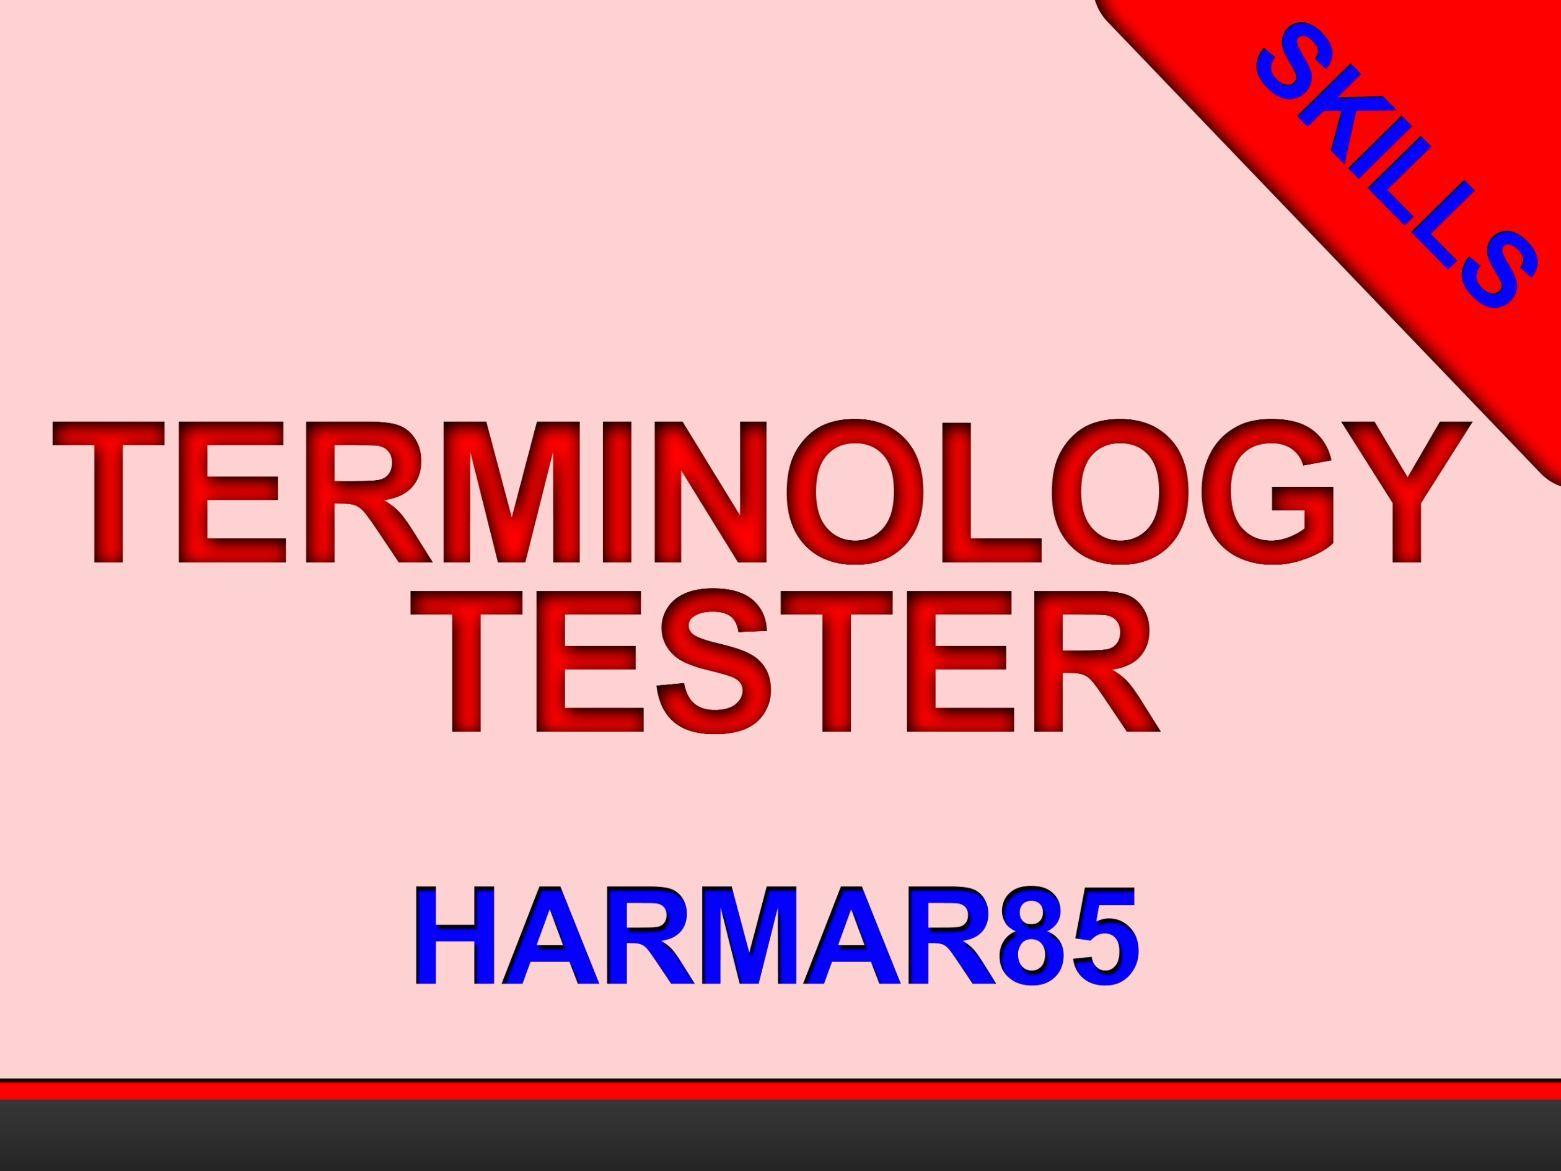 TERMINOLOGY TESTERS - MEDIA STUDIES - X10 files